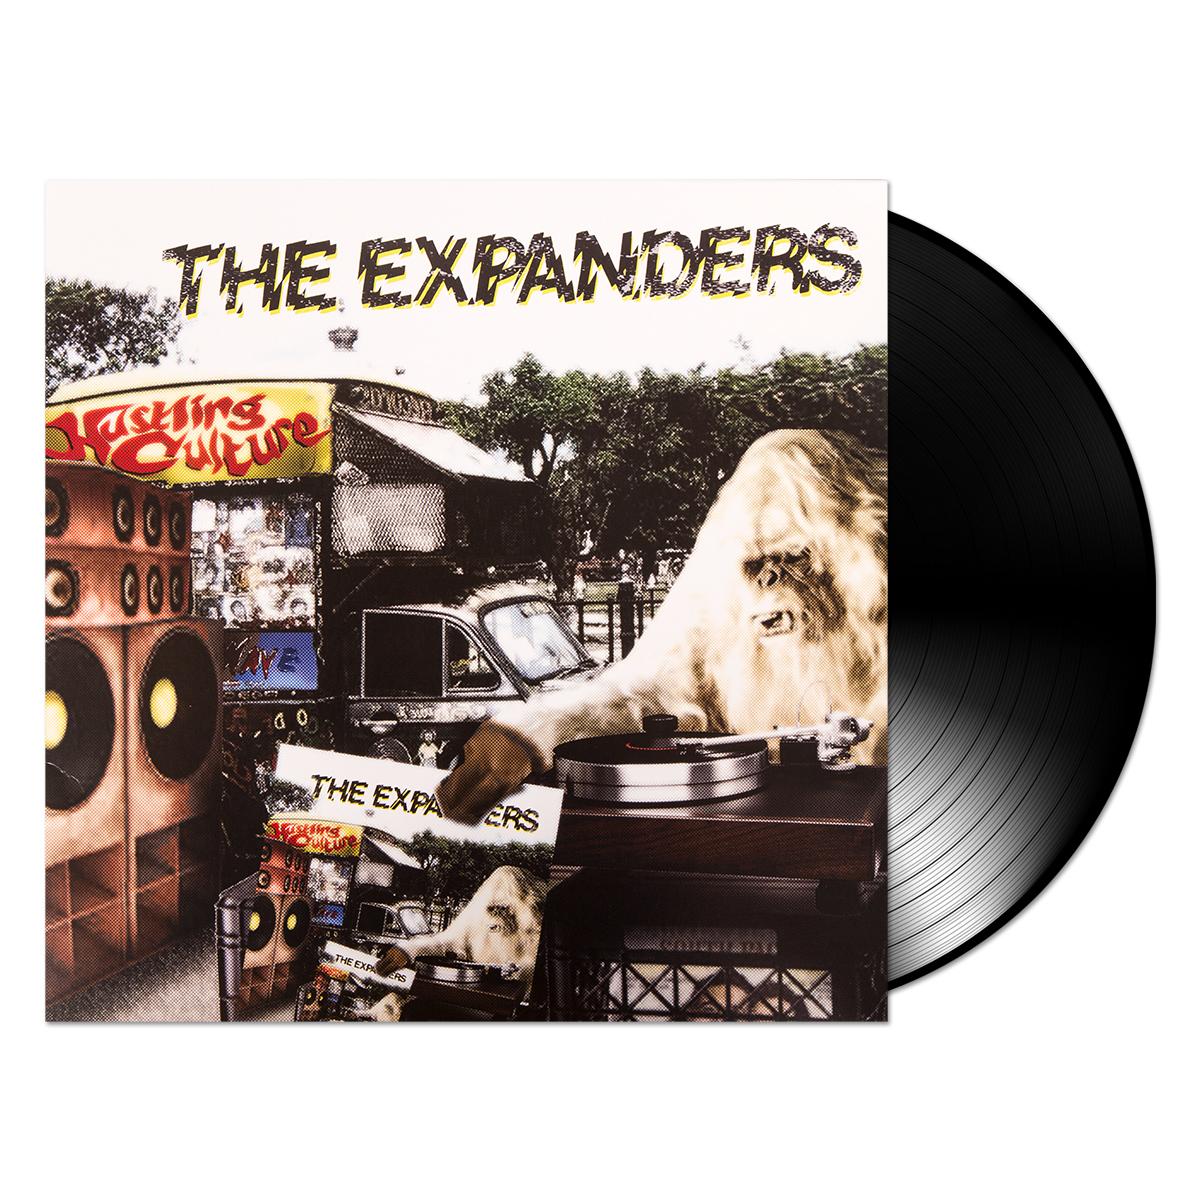 The Expanders Hustling Culture LP